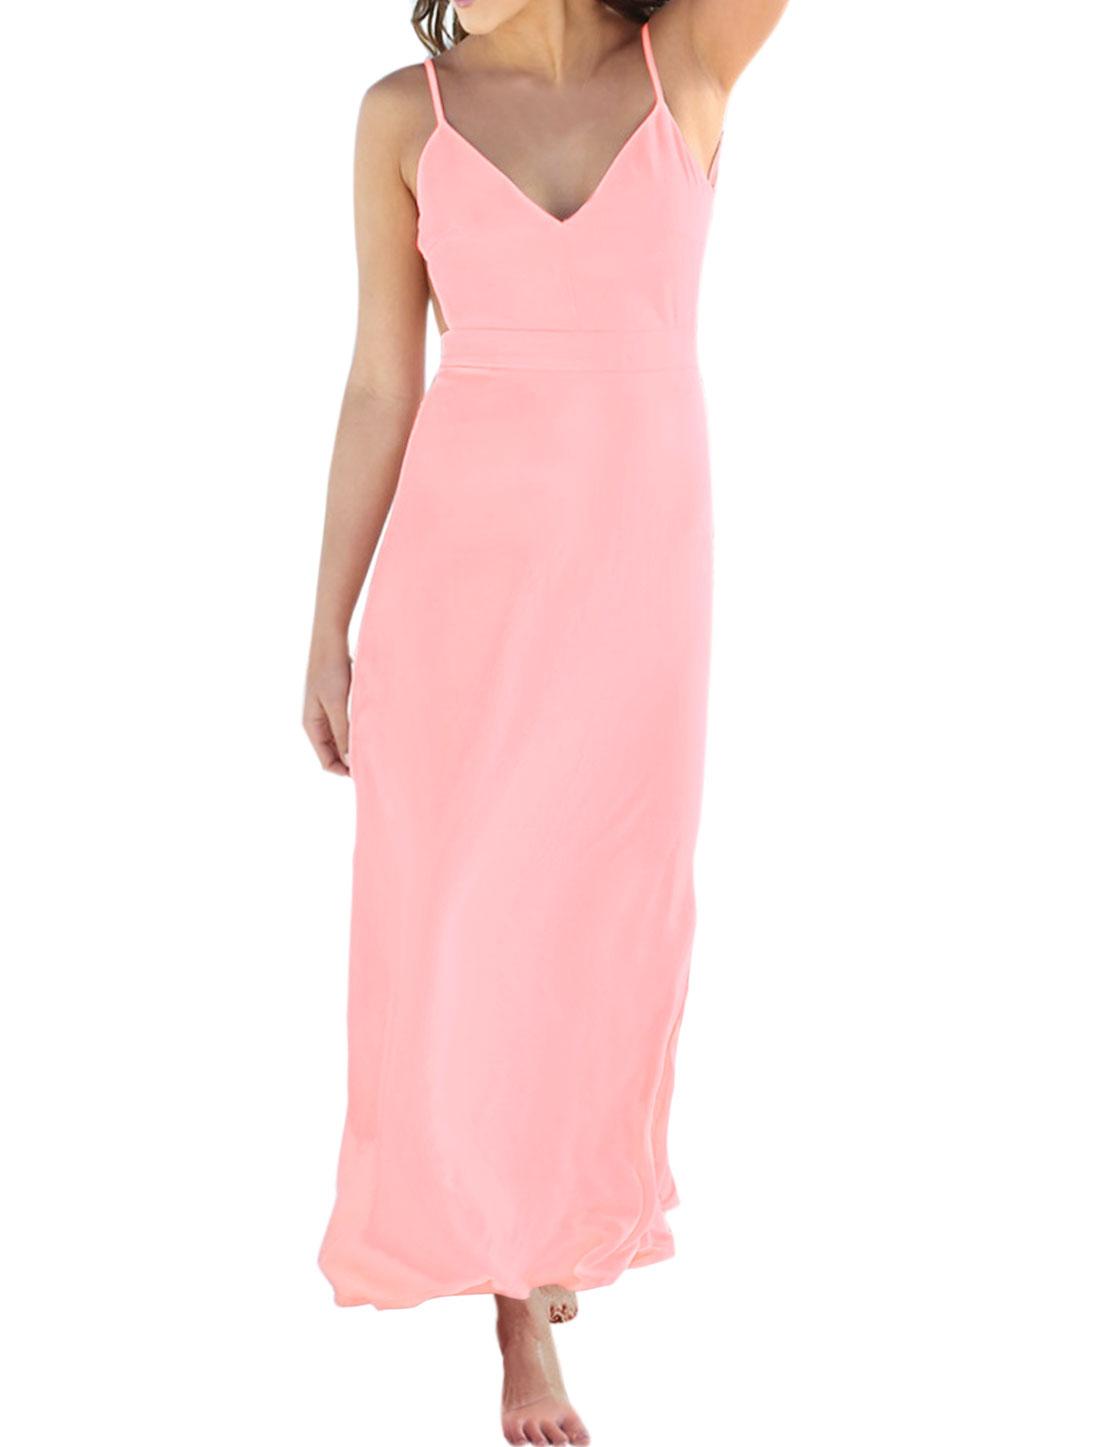 Women Backless V Neckline Spaghetti Straps Cami Dress Pink L